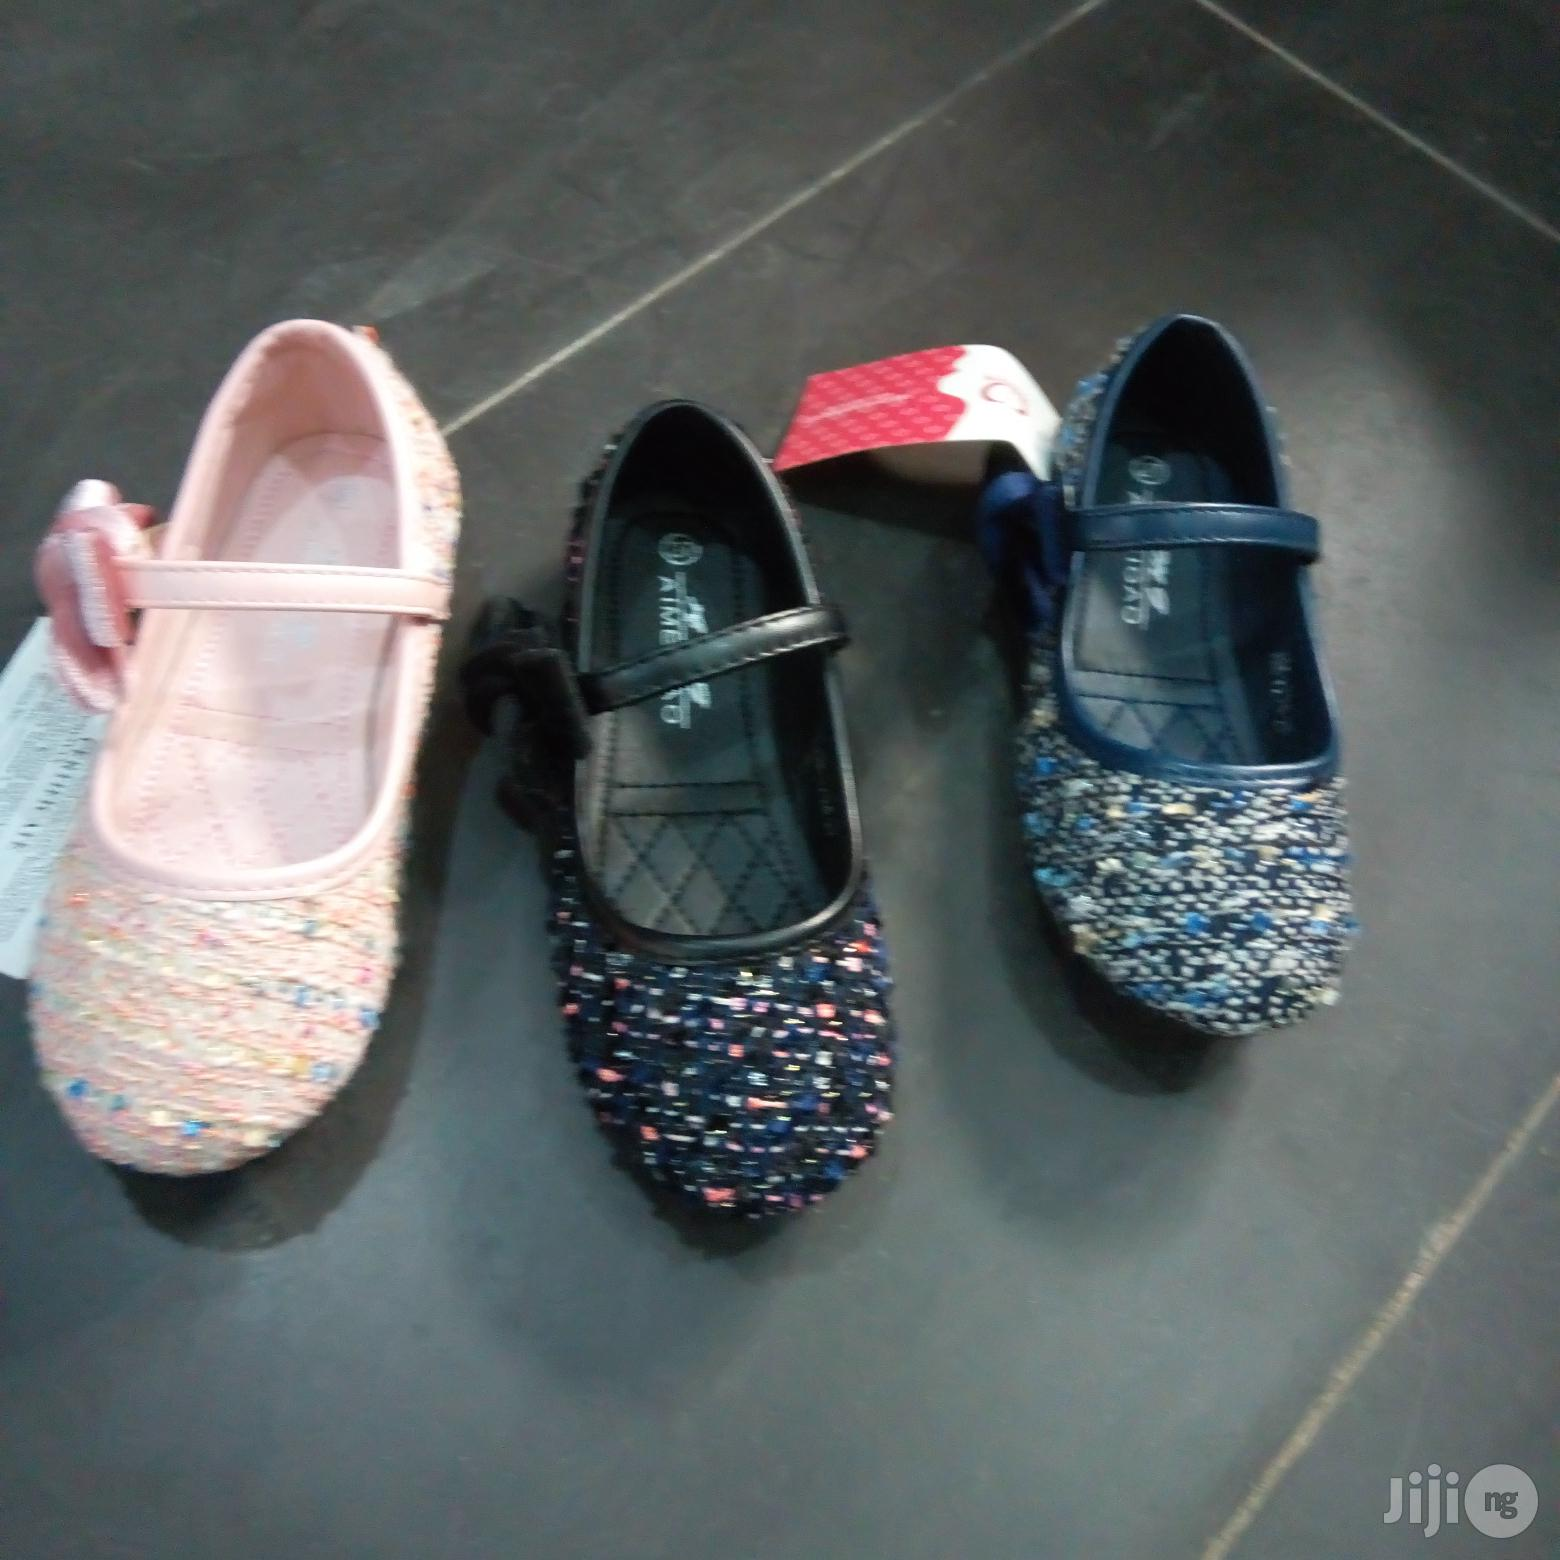 Aimeigo Girl's Shoe   Children's Shoes for sale in Yaba, Lagos State, Nigeria